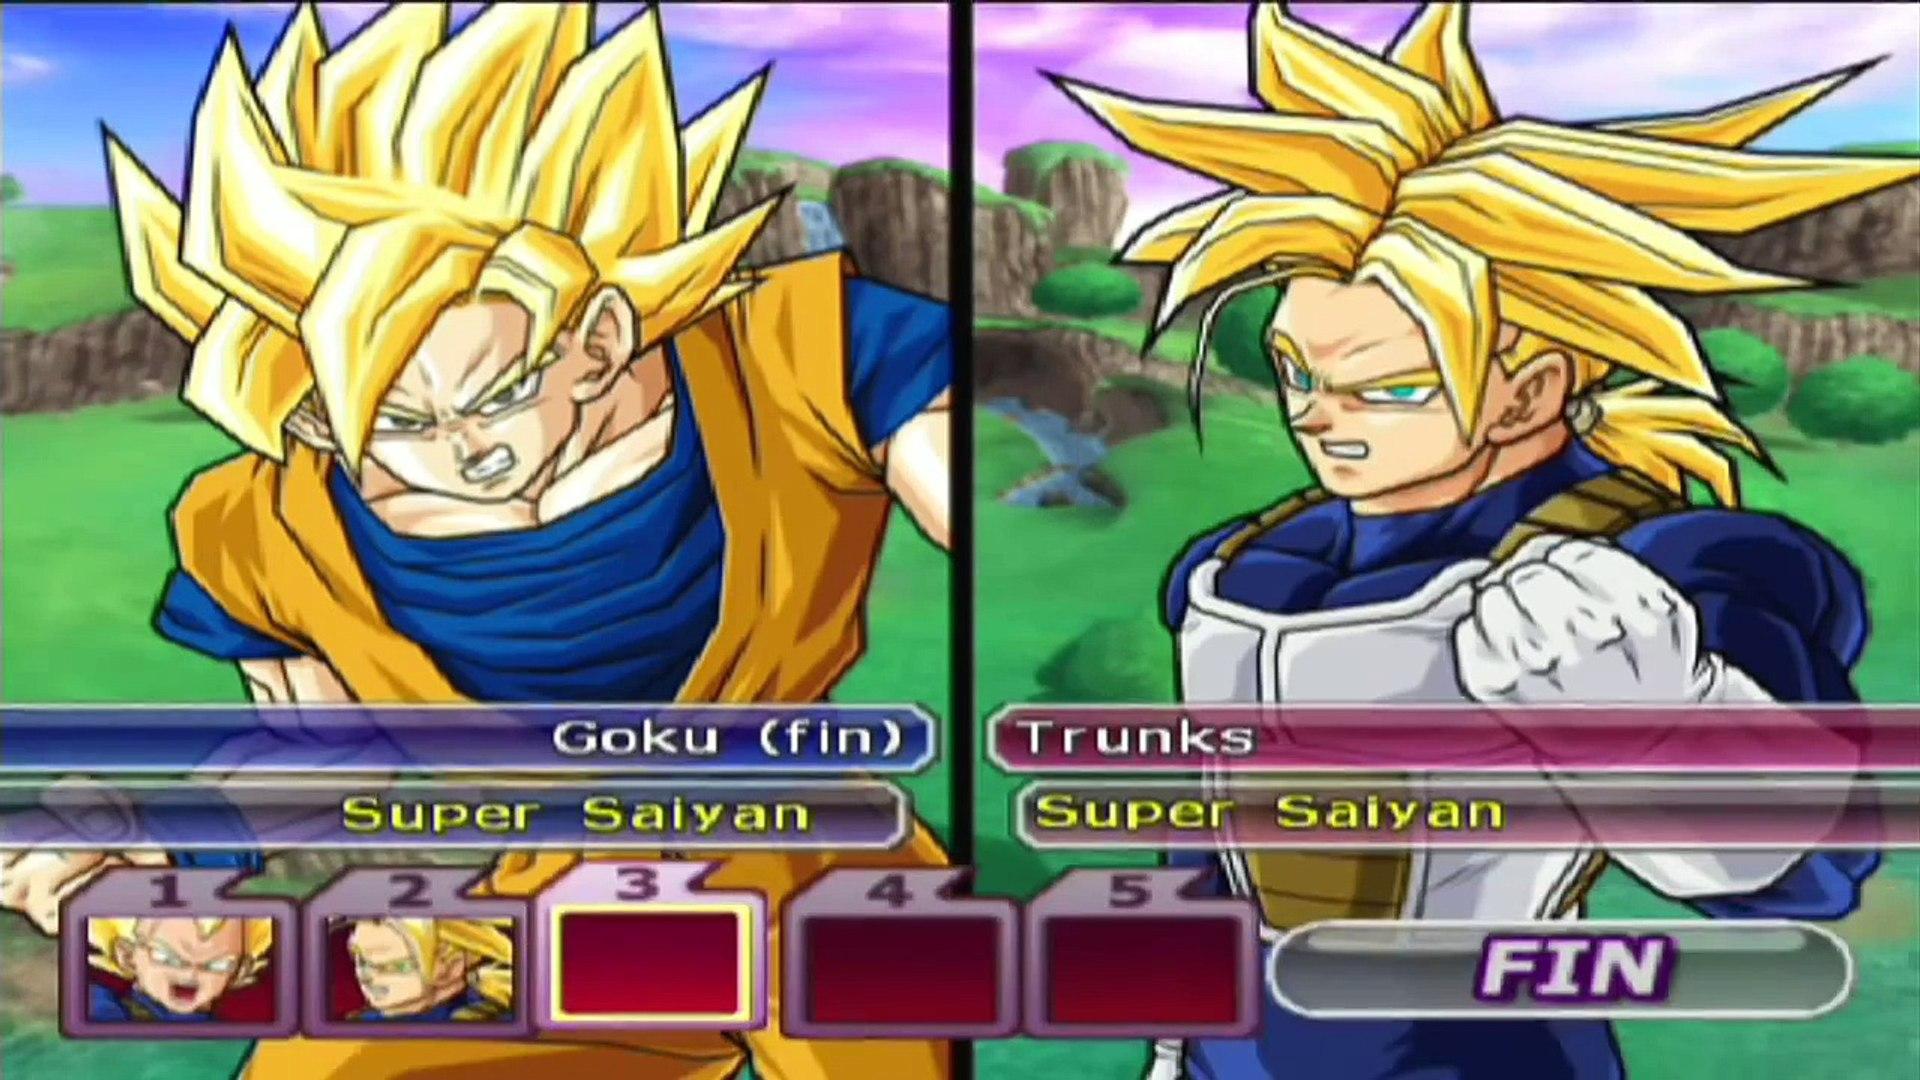 Dragon Ball Z Budokai Tenkaichi 3 Goku Gohan Vs Vegeta Trunks